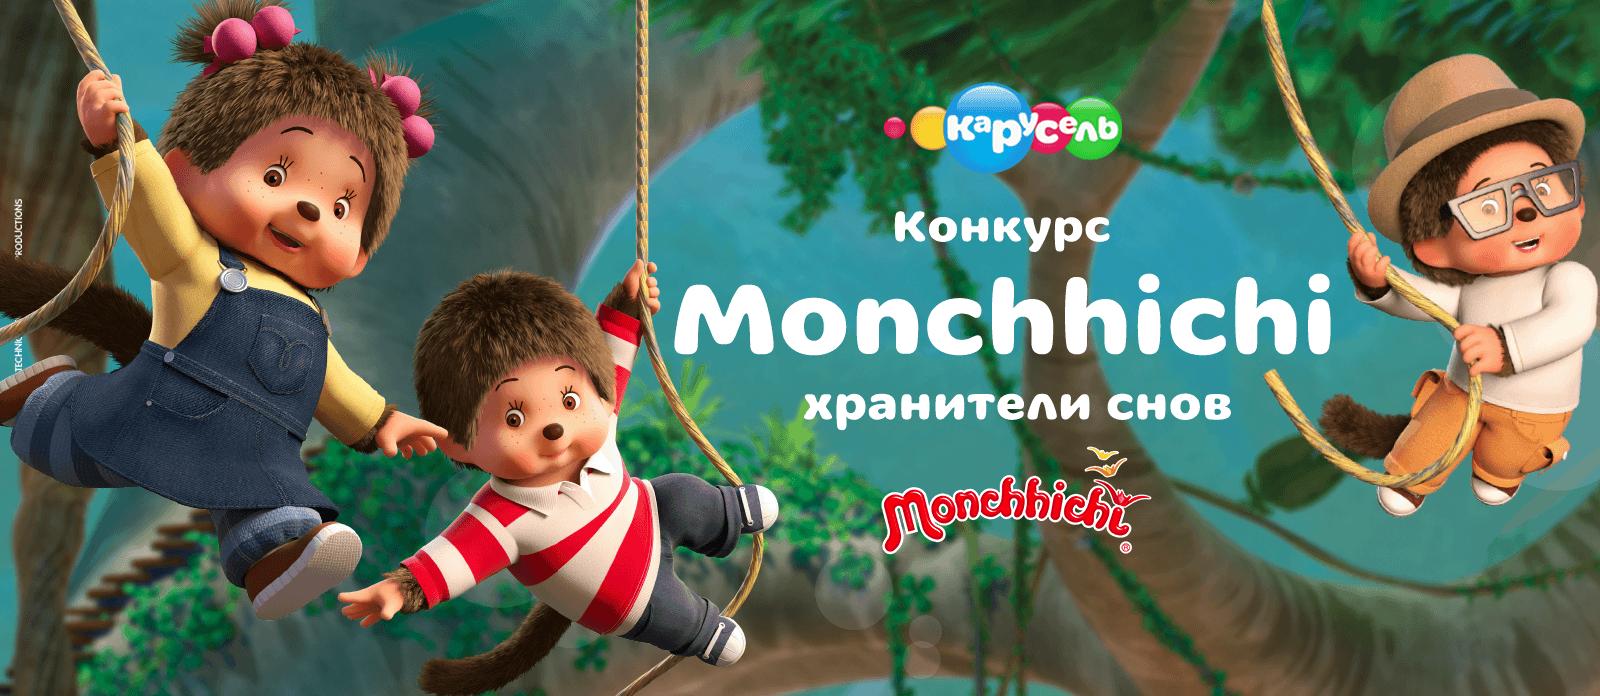 Конкурс «Monchhichi – хранители снов»